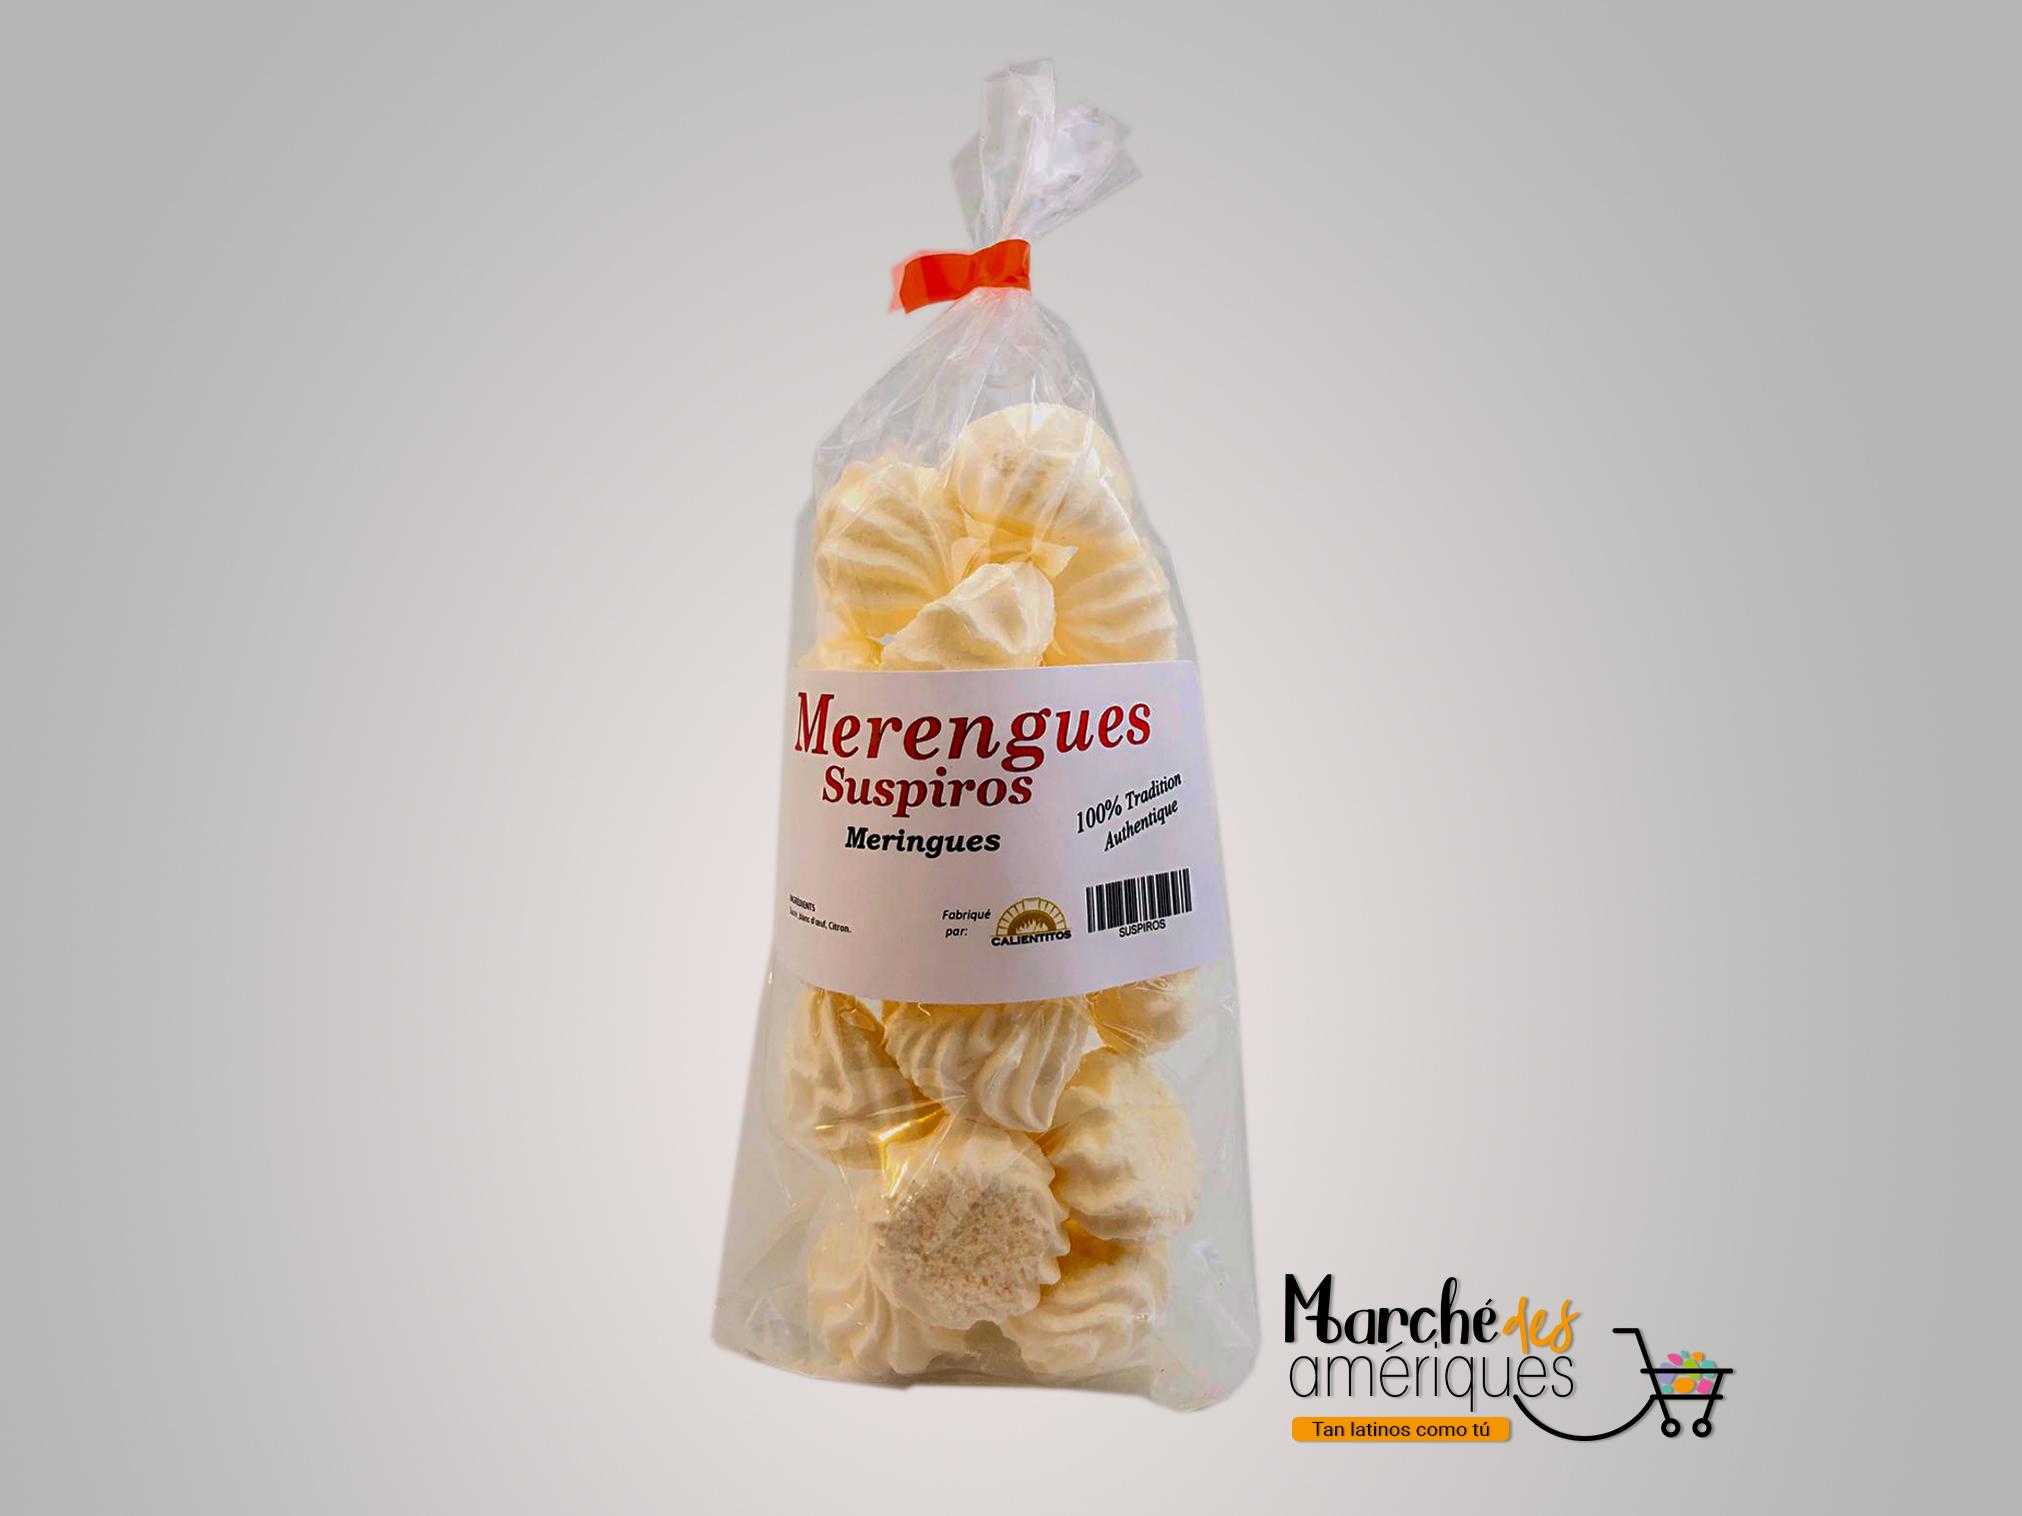 Merengues Suspiros - Marché des Amériques - Código de Barras